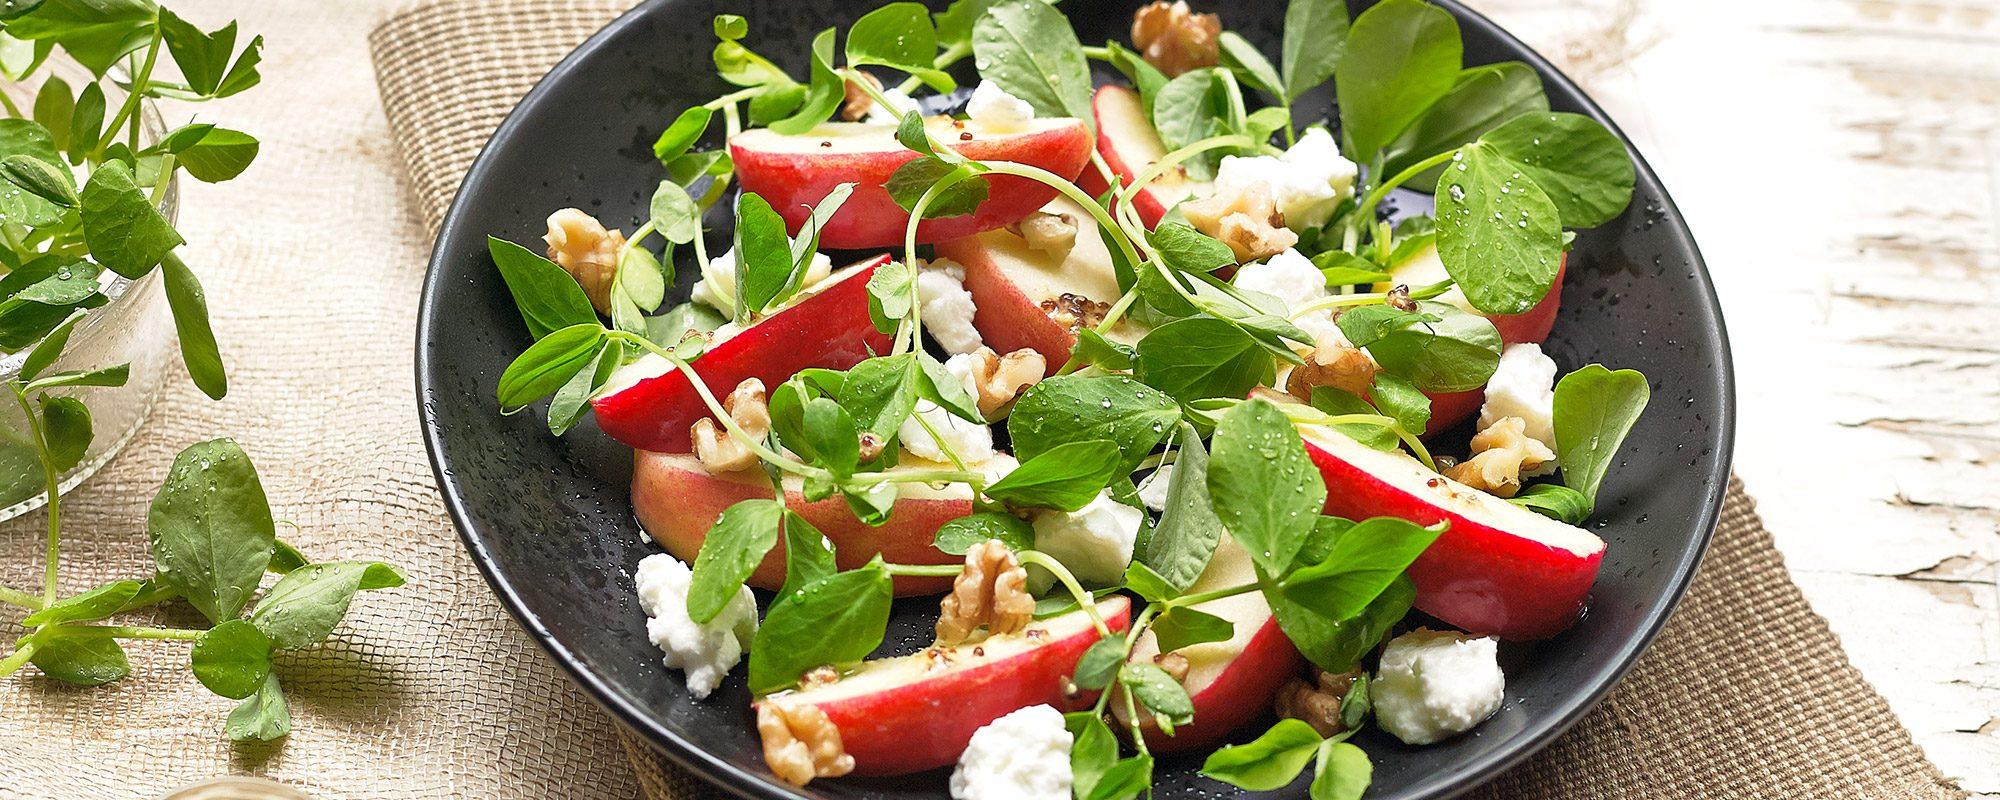 Pea shoots, apple, feta and walnut salad